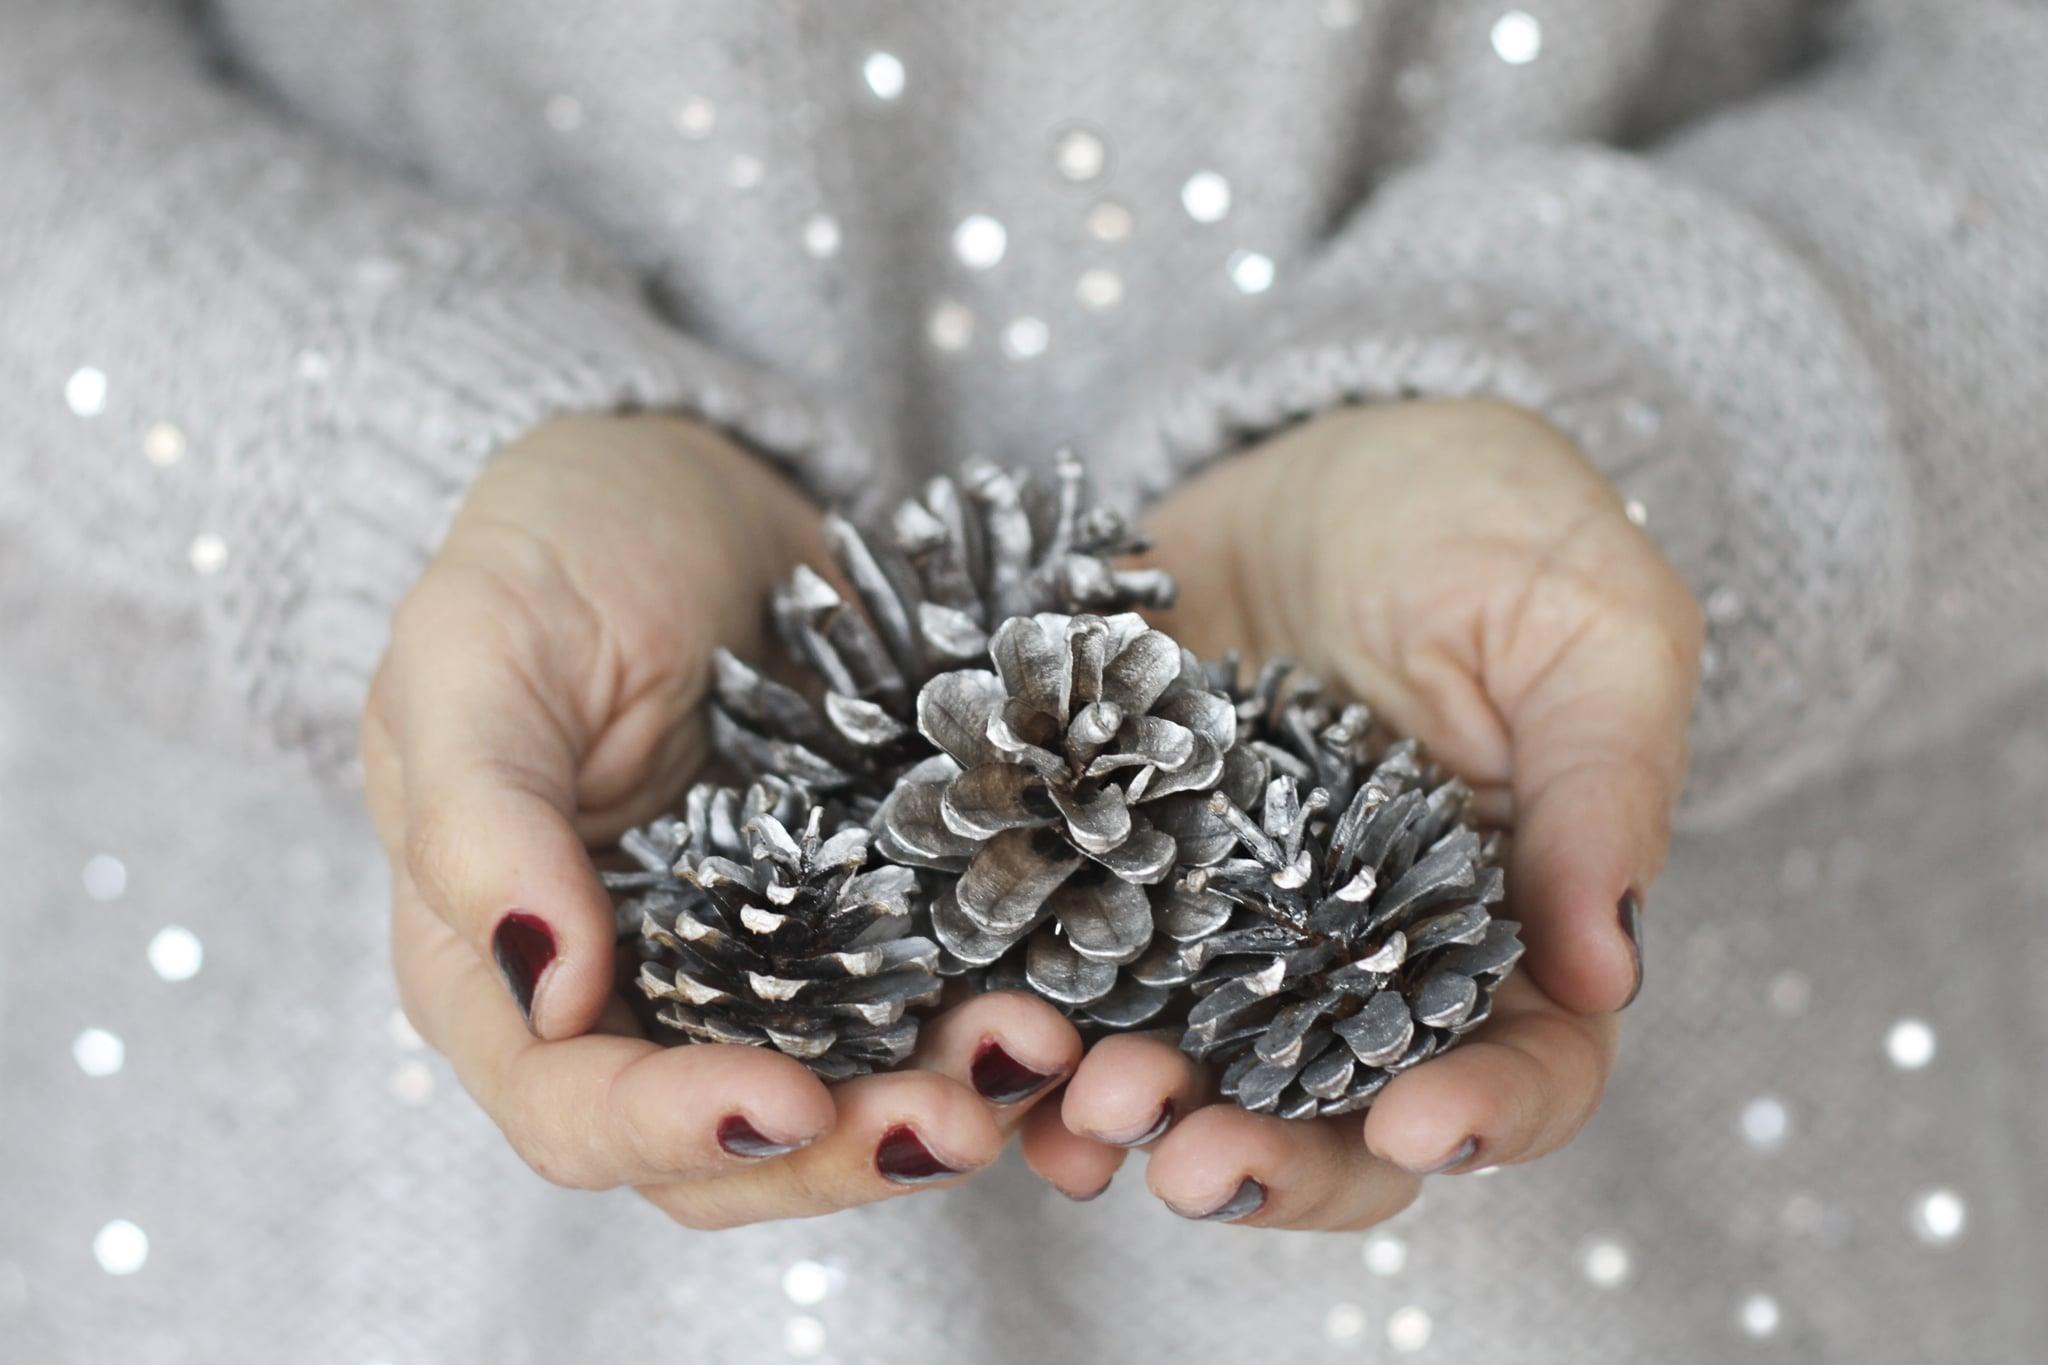 Woman holding pine cones